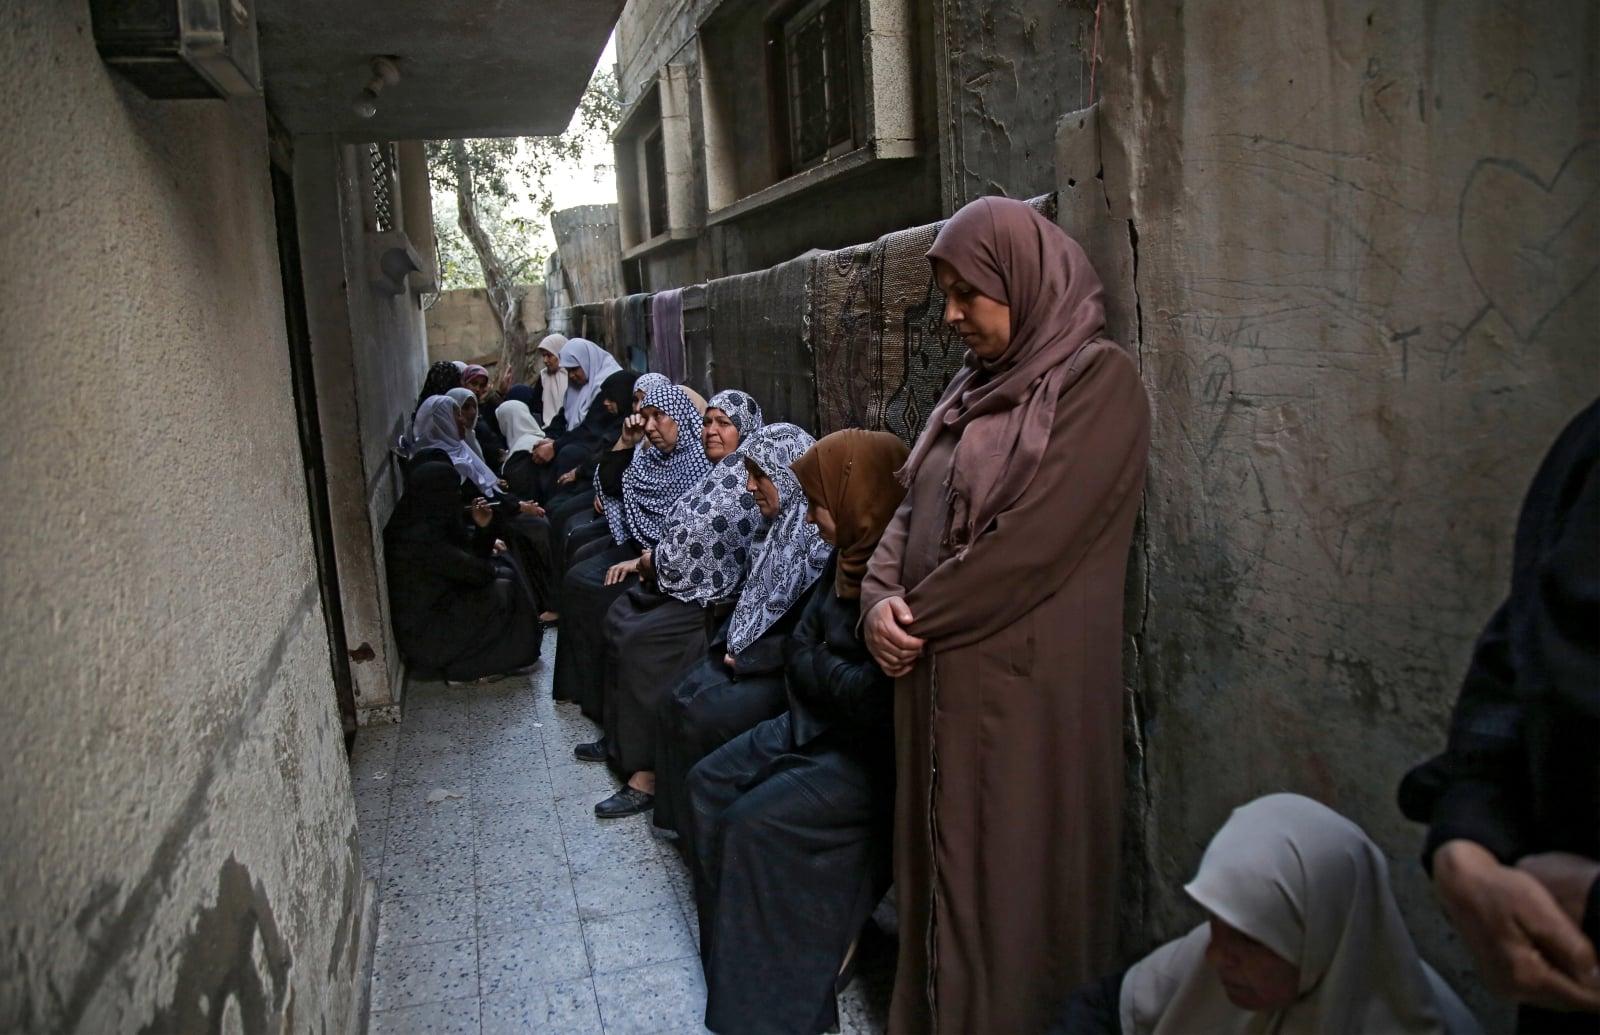 Konflikt izraelsko-palestyński fot. EPA/HASSAN ELJEDI